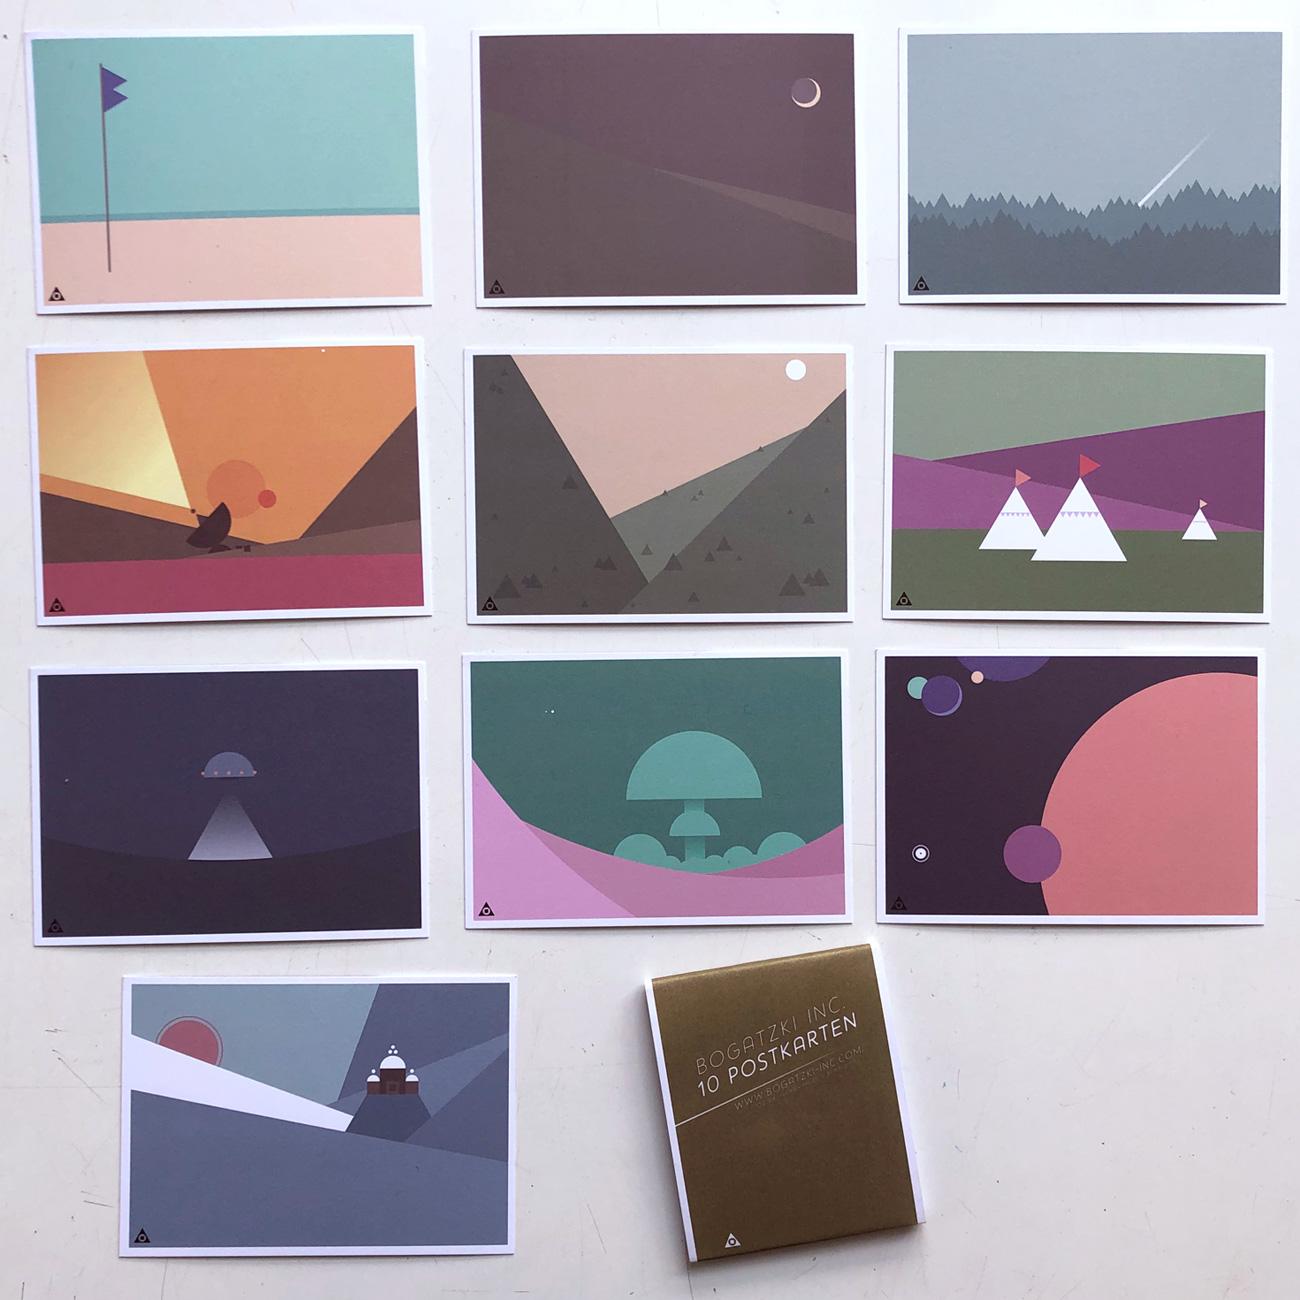 Bogatzki Inc., 10 Postkarten im Set, sphärisch